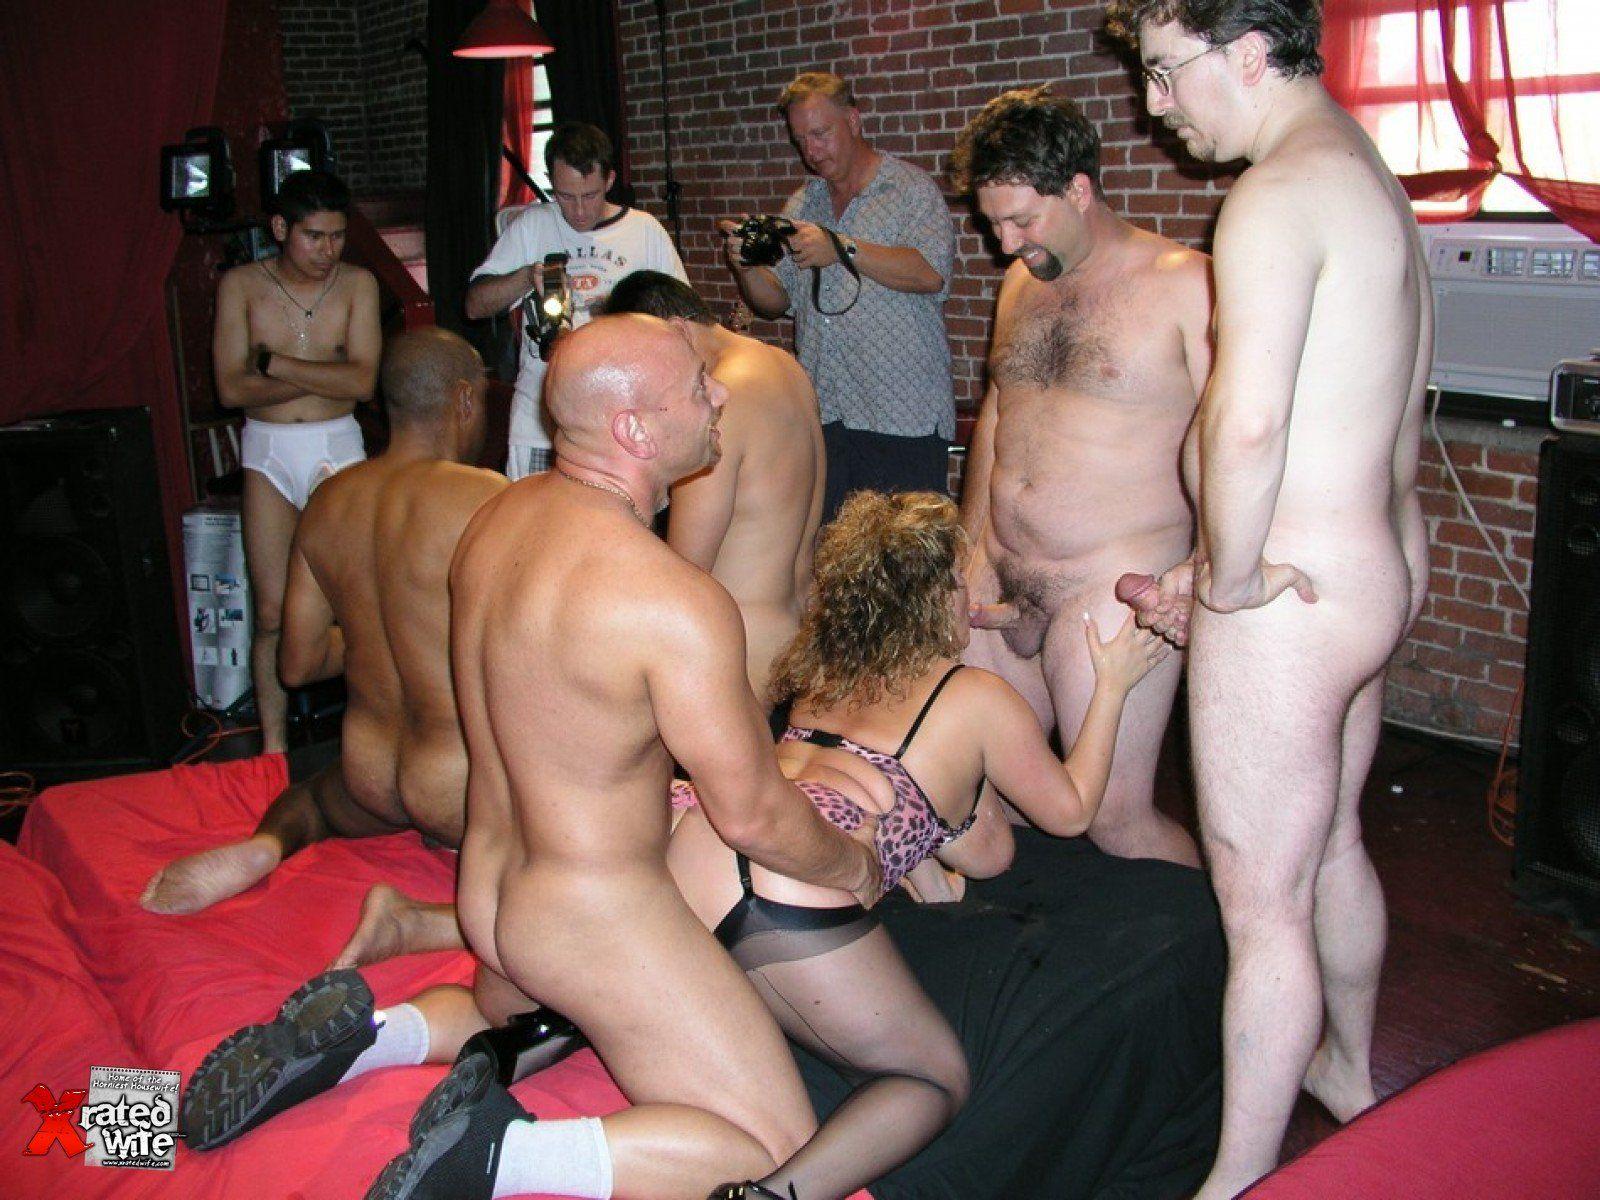 Naked photo adult orgy gangbang sites